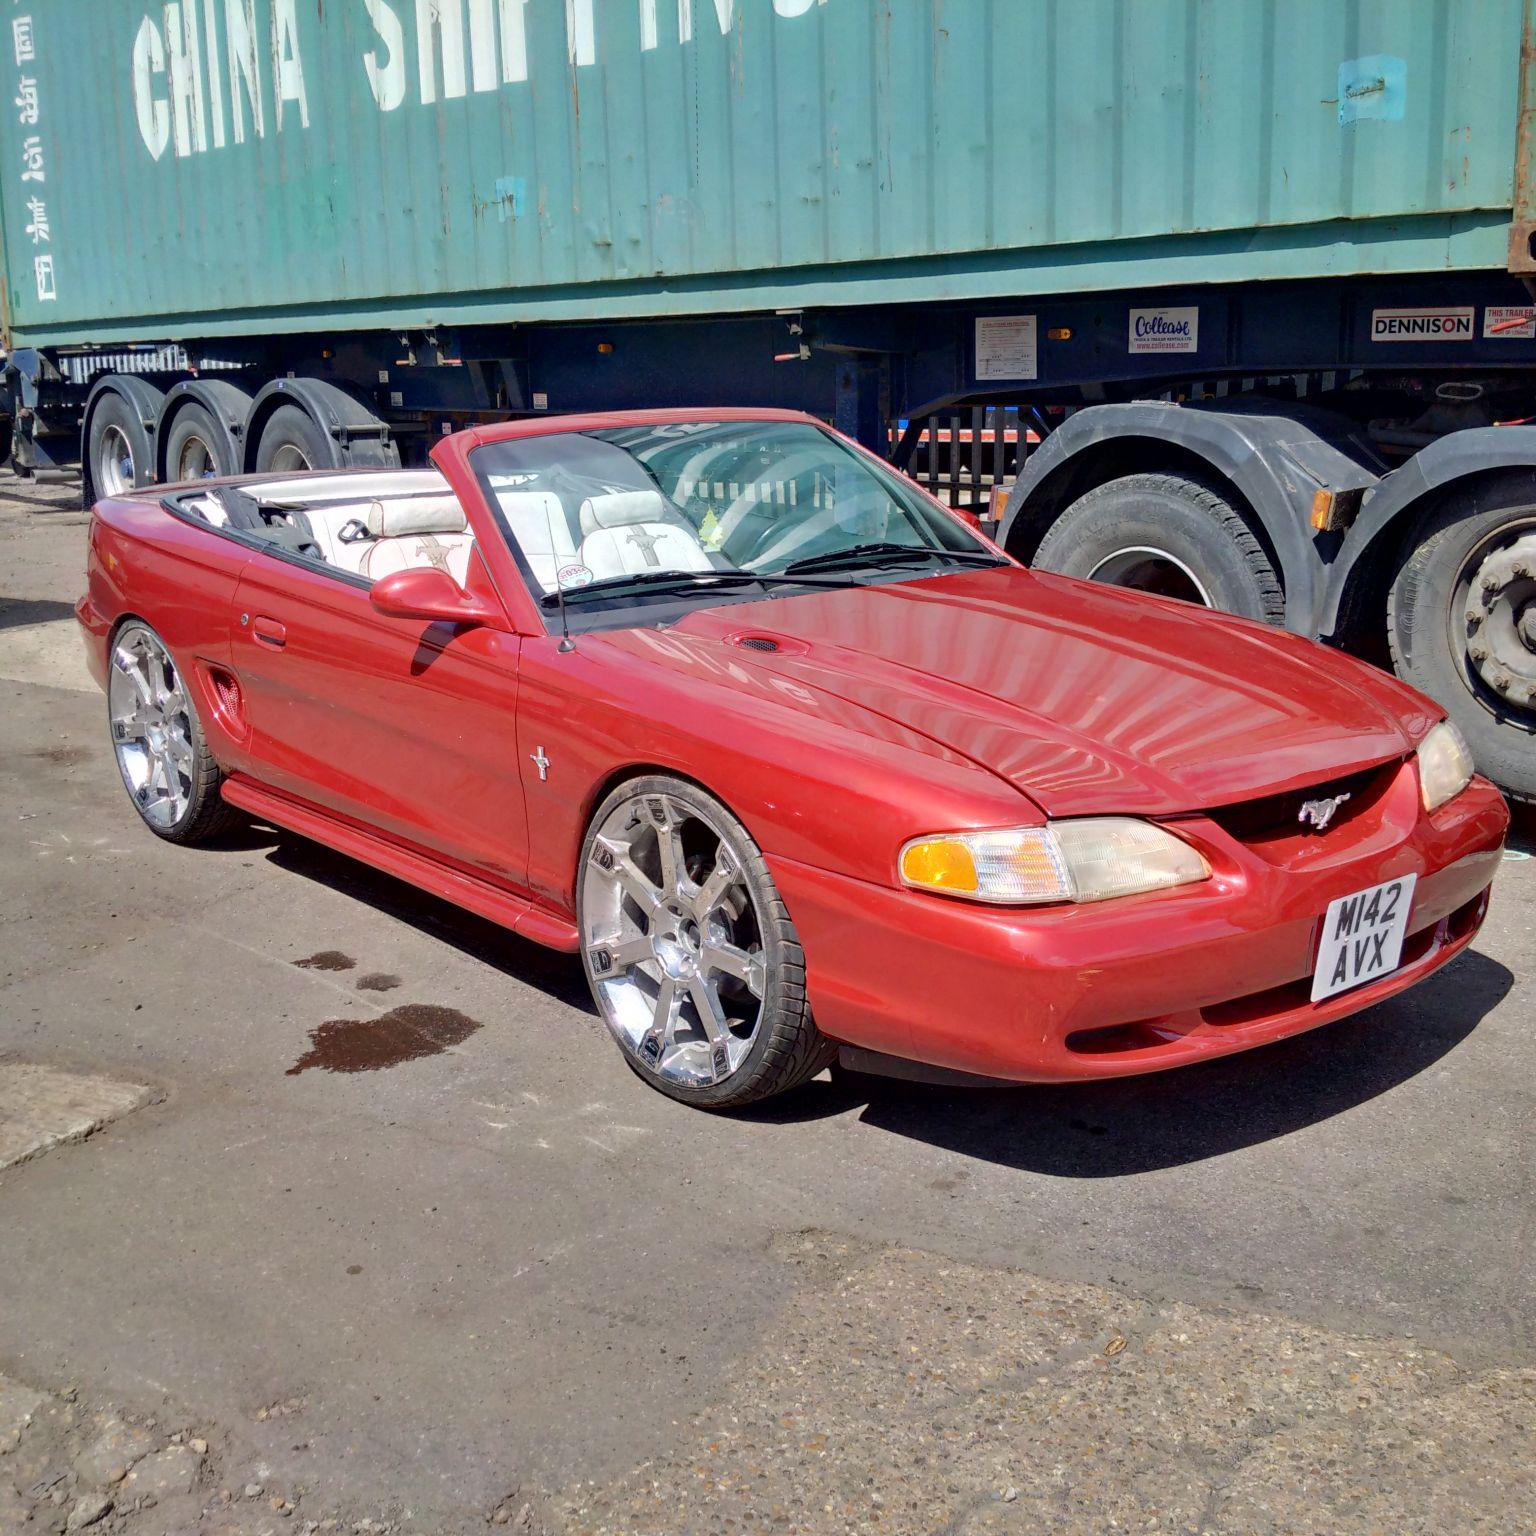 Left hand drive Ford Mustang 3.8 V6 convertible. UK registered.